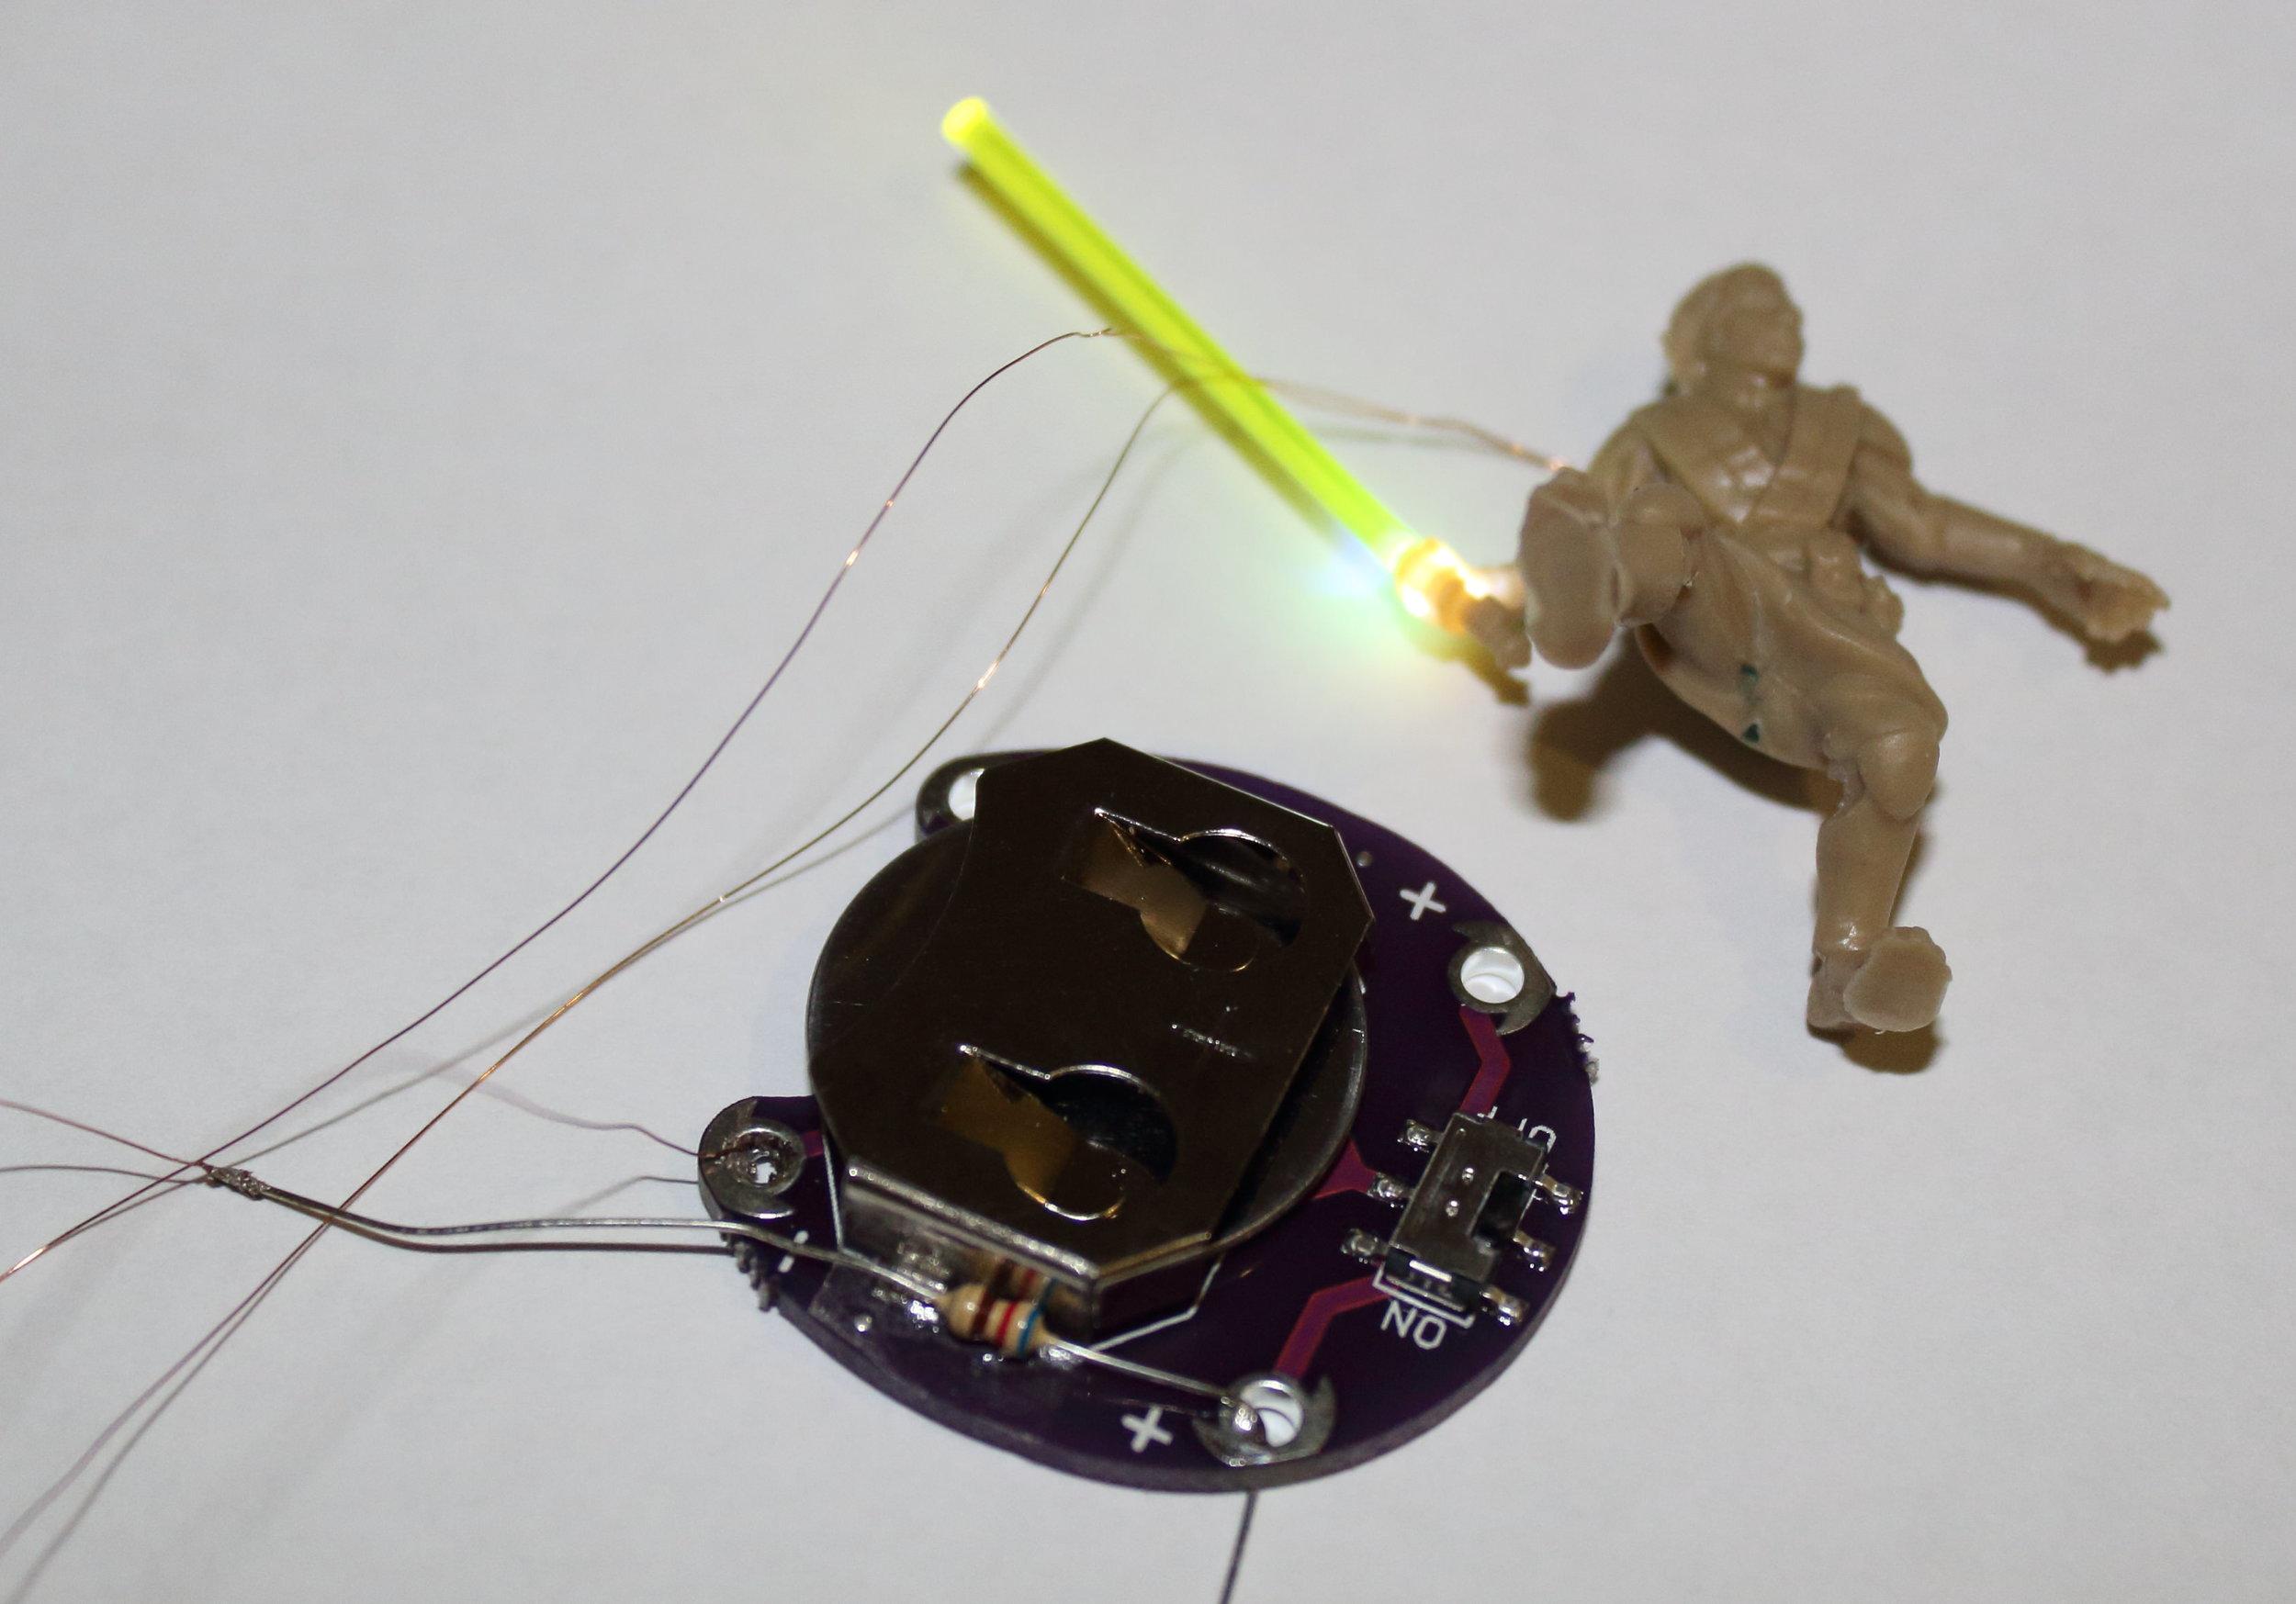 Imperial_Assault_Board_Game_LED_lightsaber_miniature_07.jpg